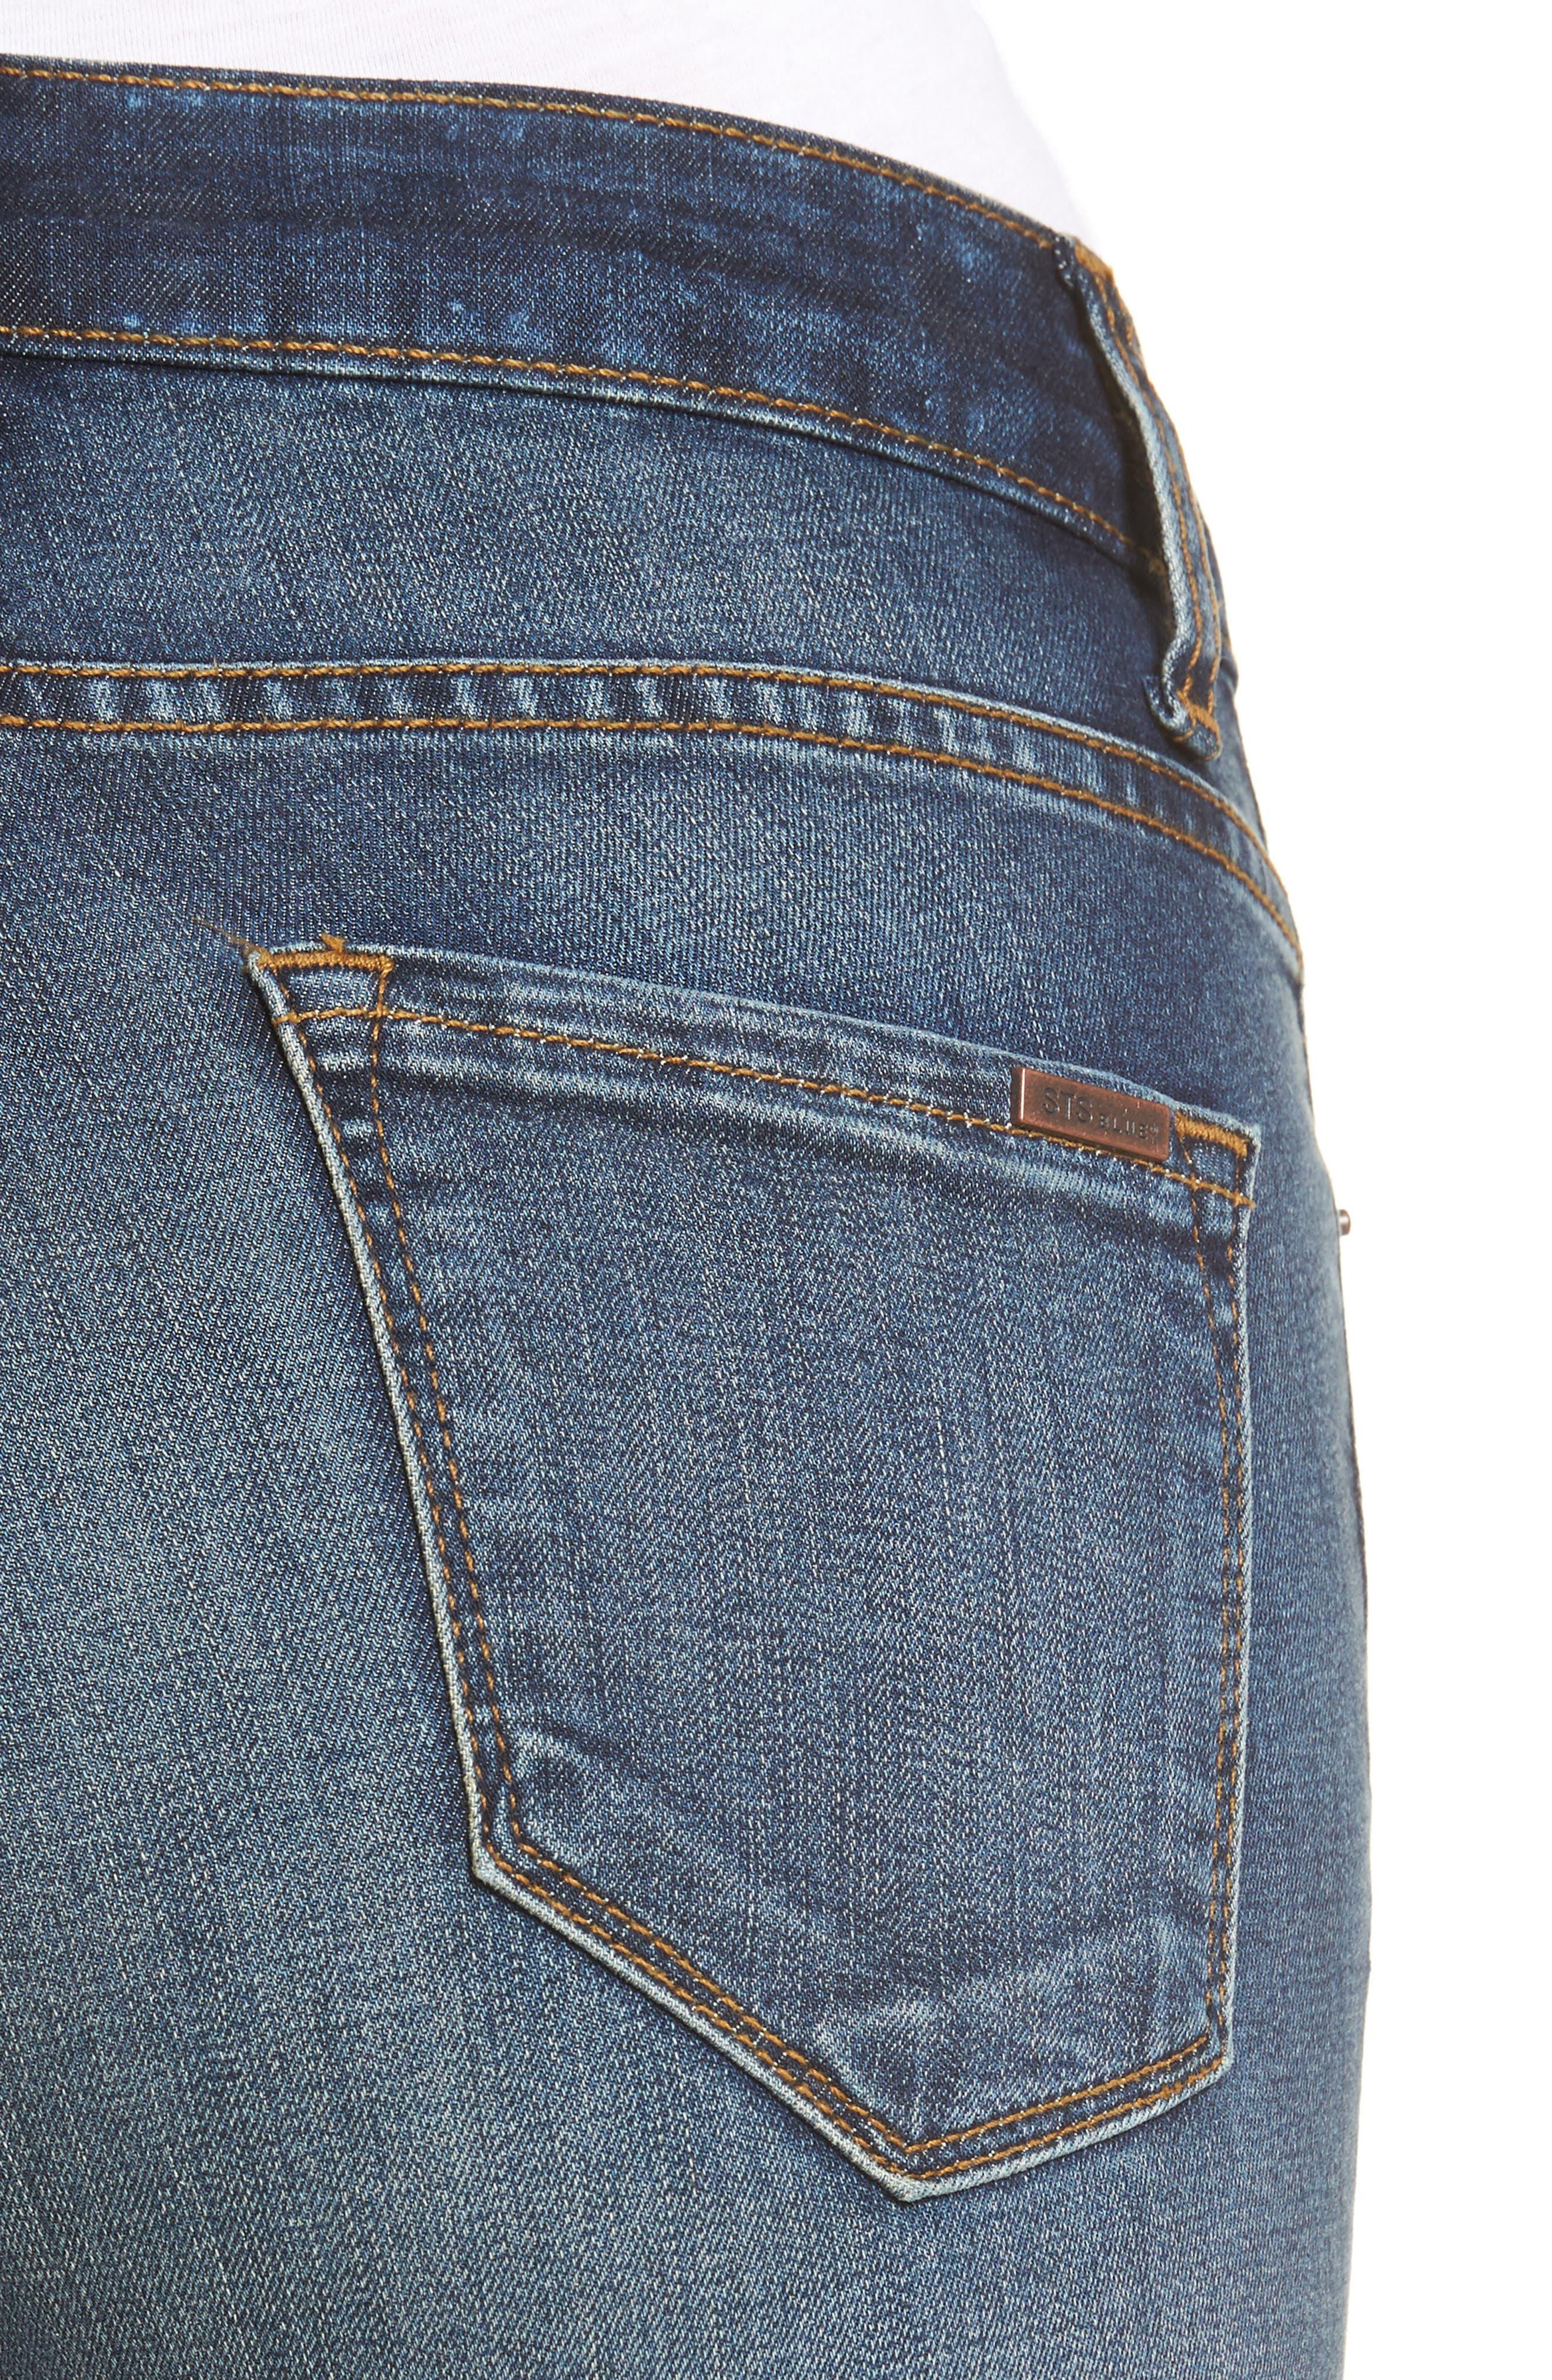 Elli Distressed Step Hem Skinny Jeans,                             Alternate thumbnail 4, color,                             Yukon